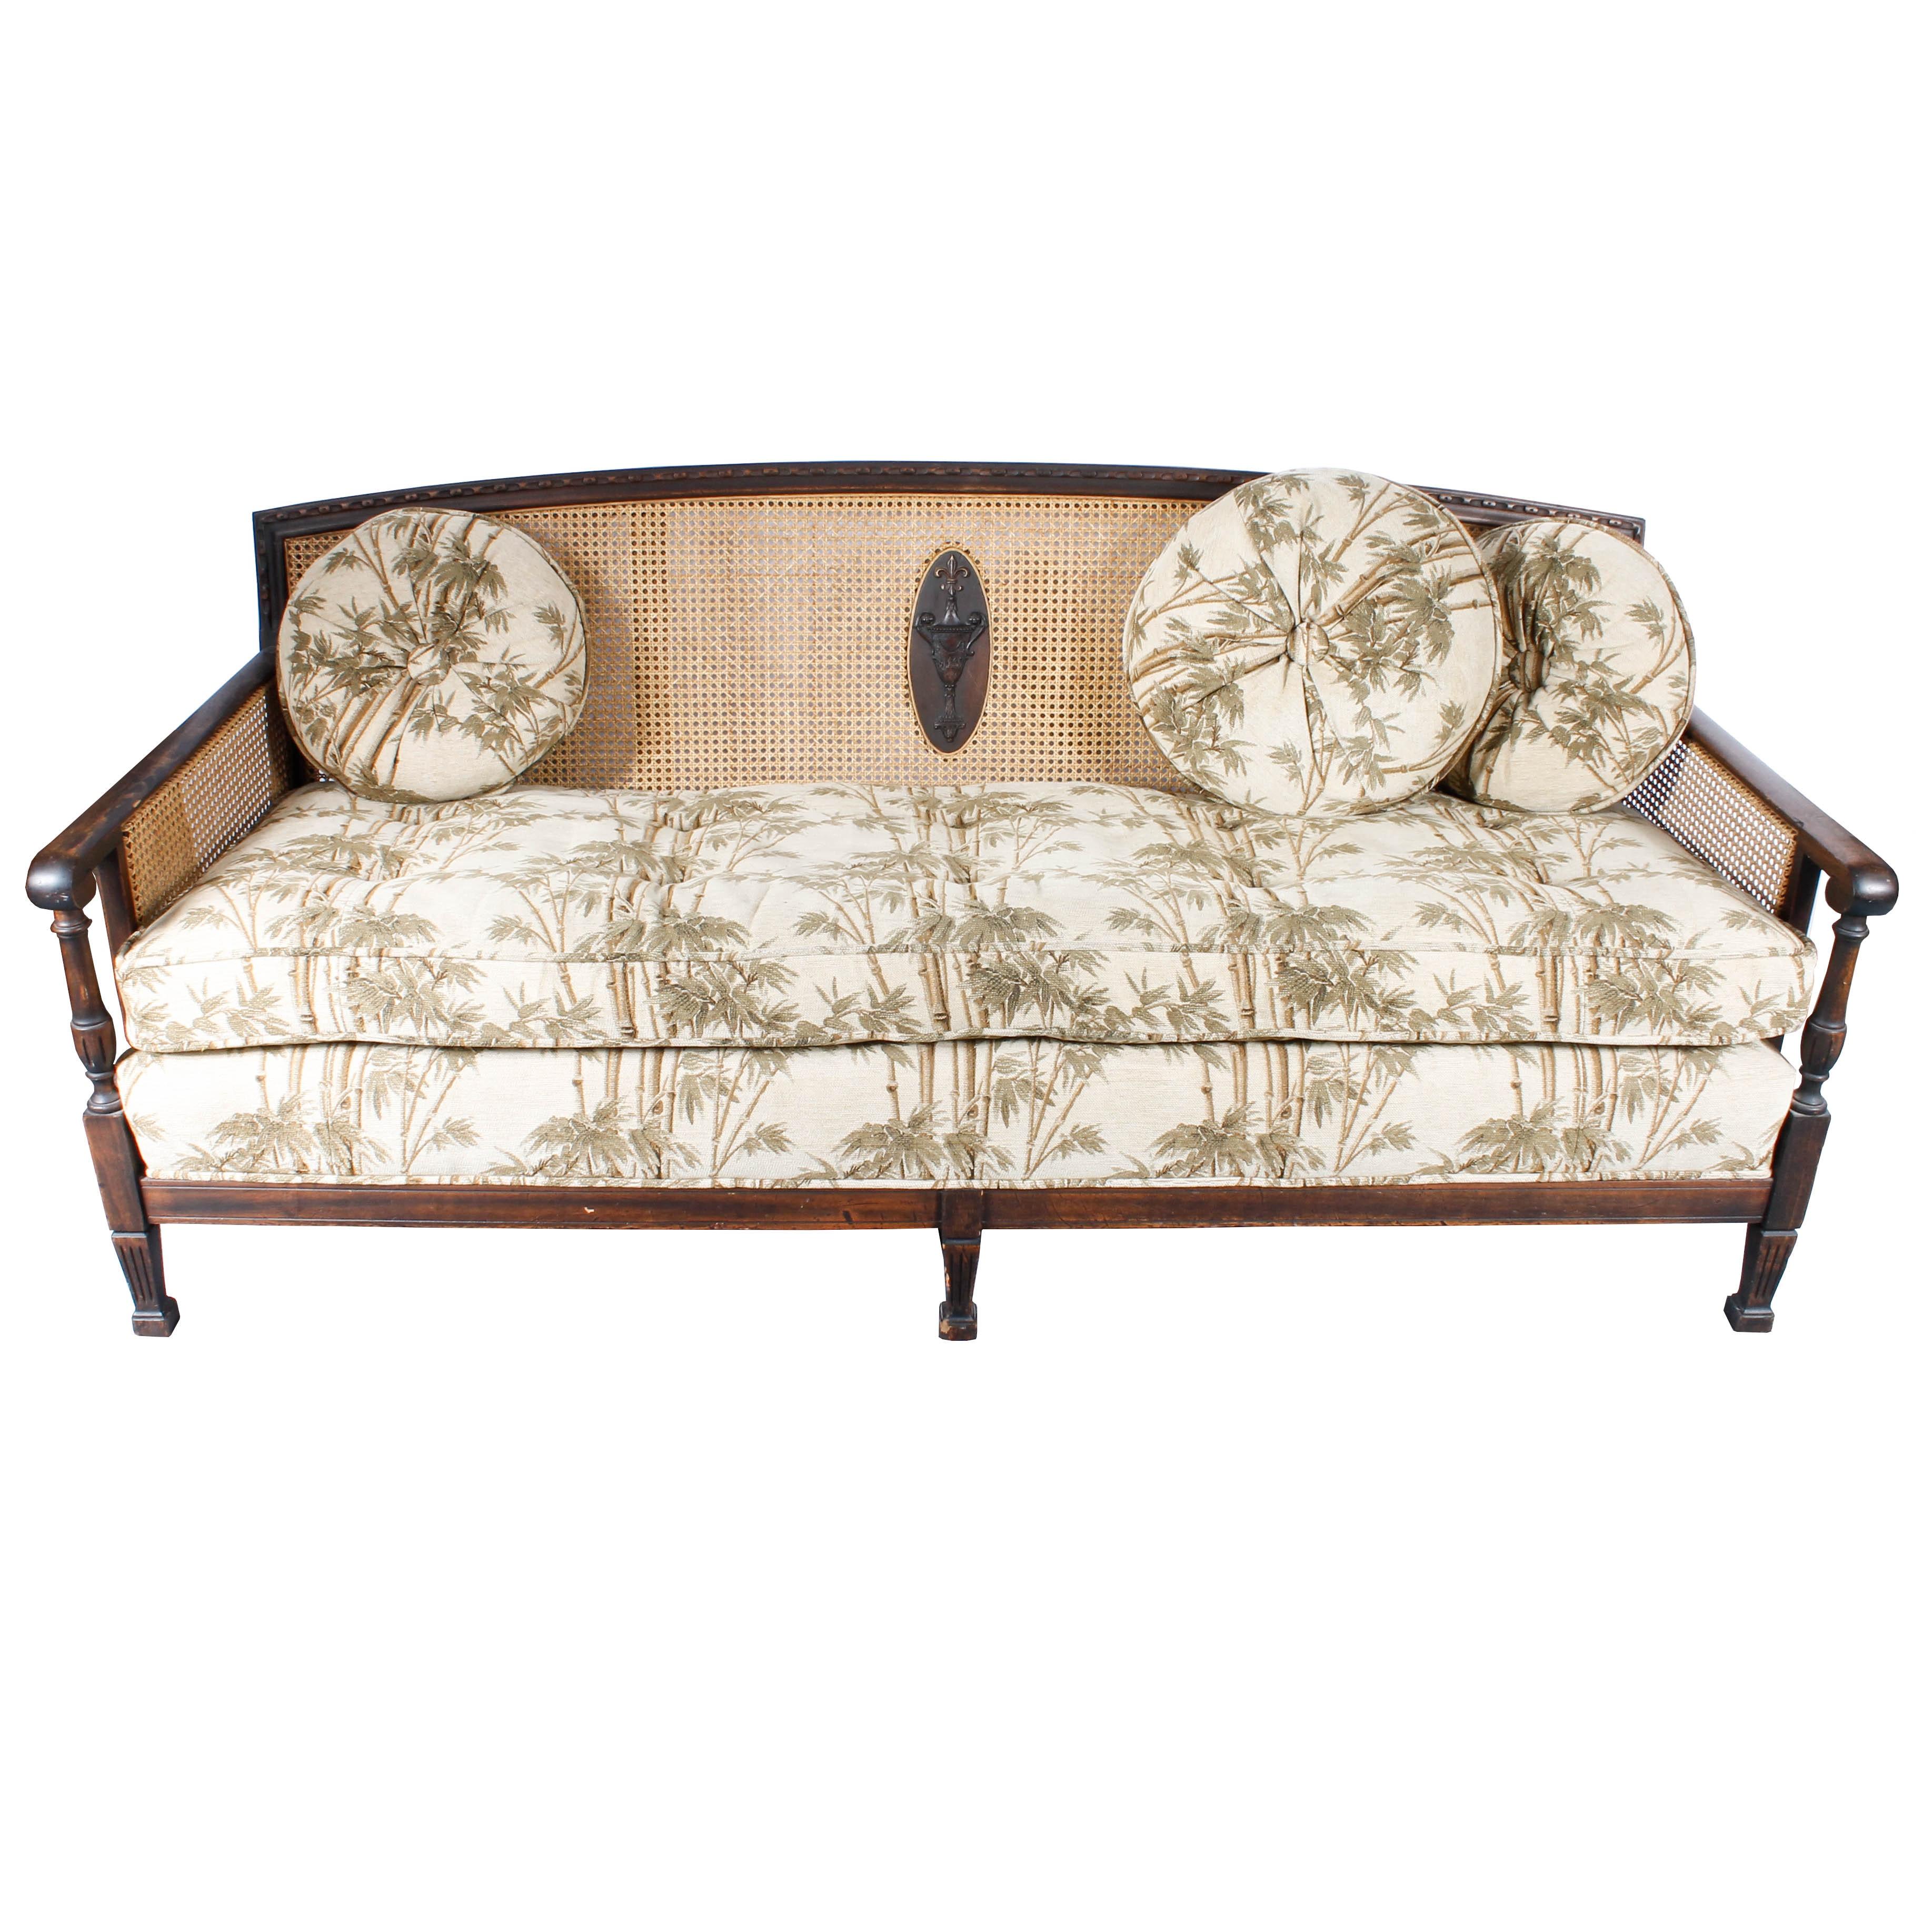 Vintage Plantation Style Caned And Upholstered Sofa ...